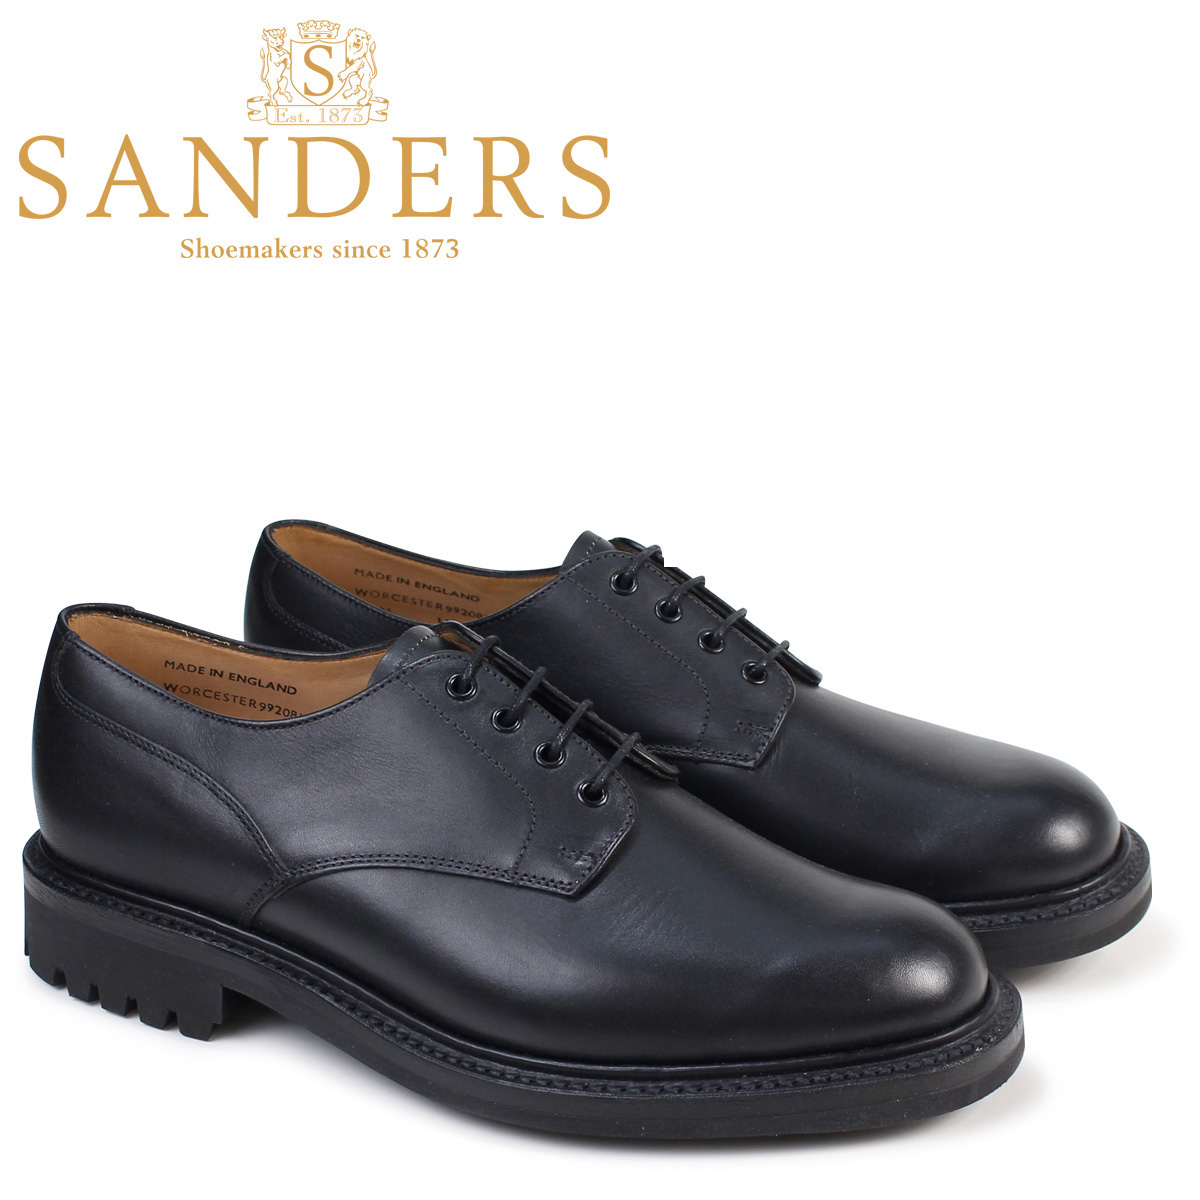 SANDERS 靴 サンダース ミリタリー オックスフォード シューズ WORCESTER 9920BW メンズ ブラック